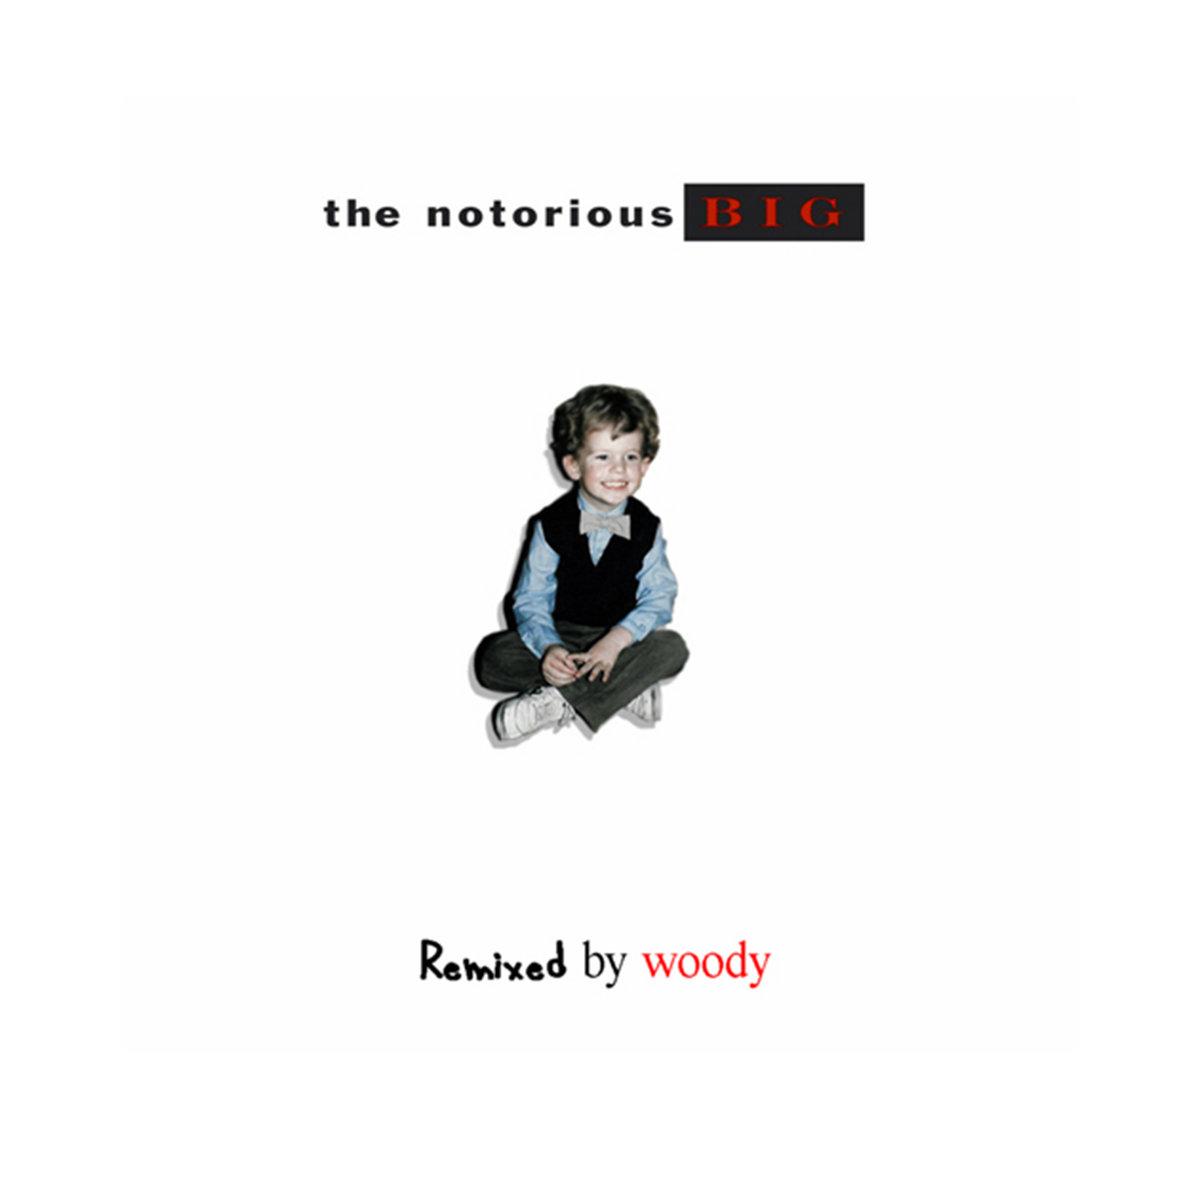 biggie notorious album download